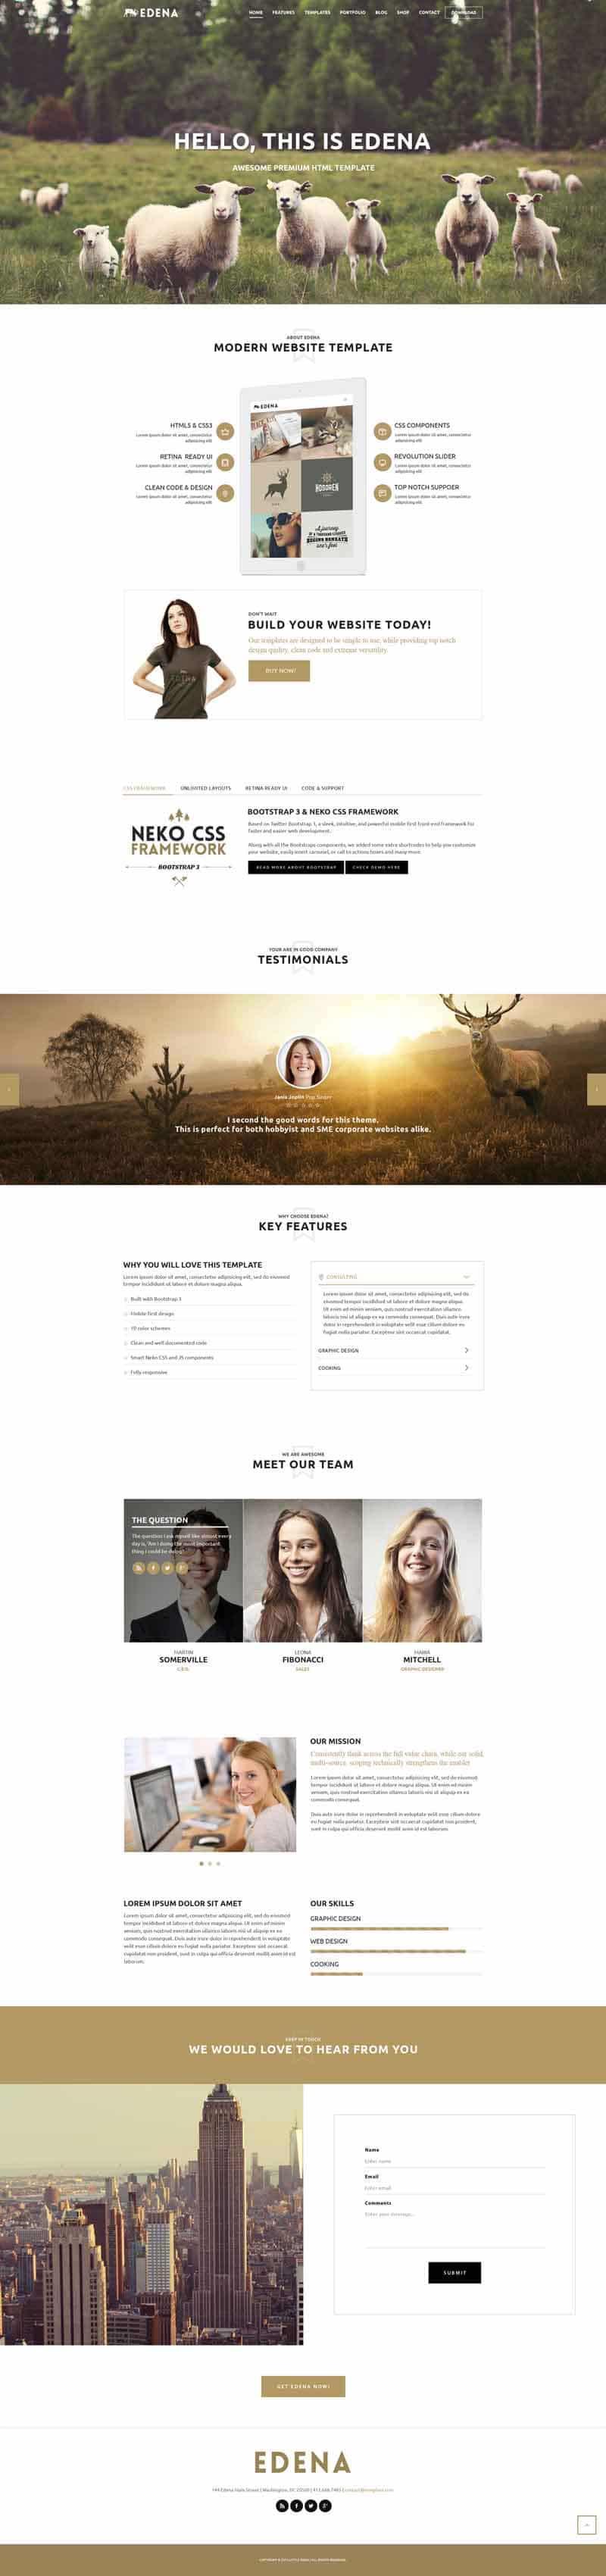 Edena - Free Website Template PSD